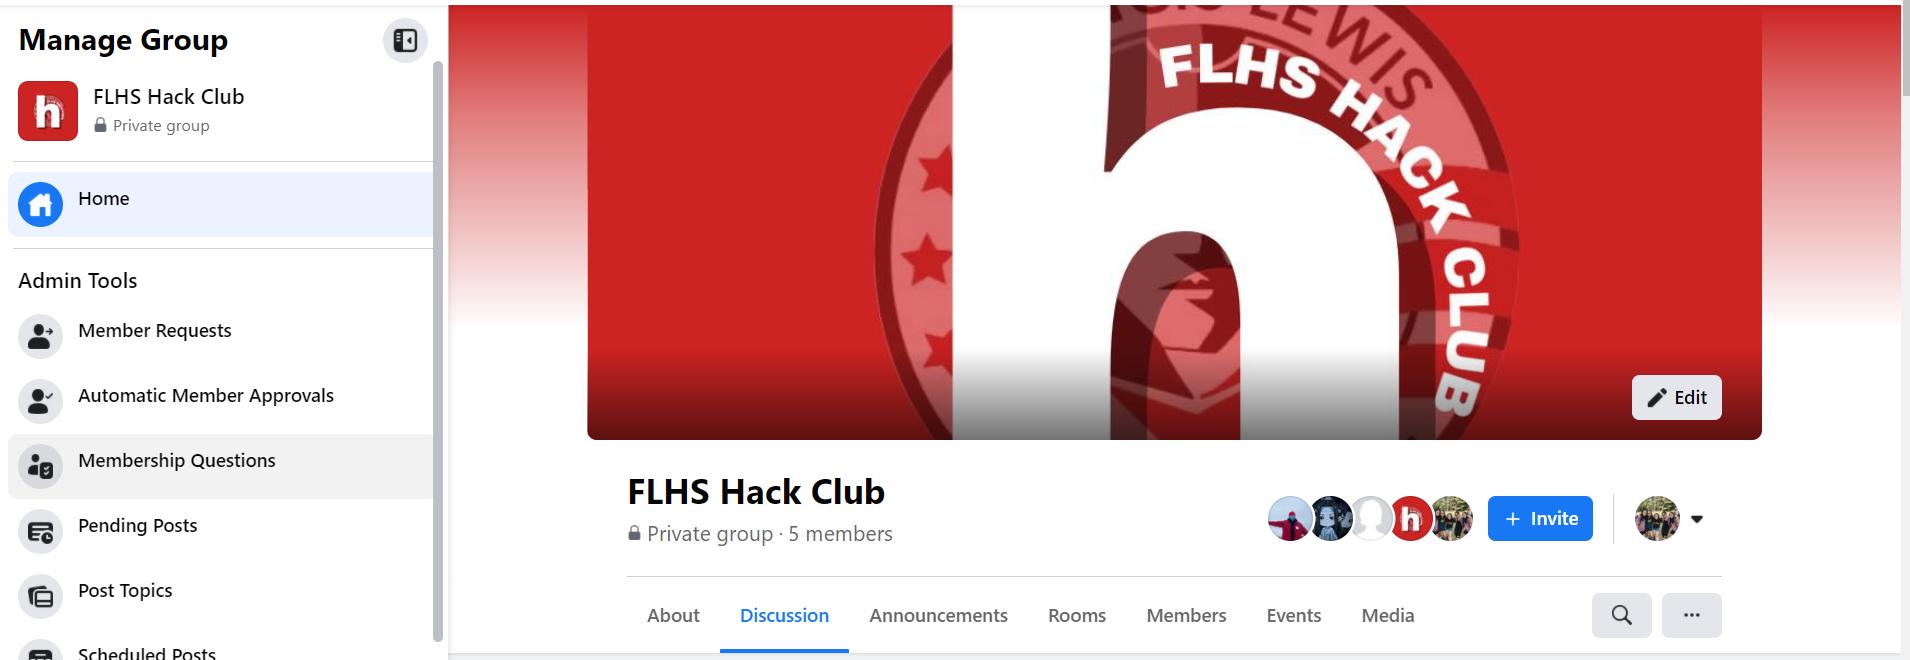 https://cloud-17fjkx19w-hack-club-bot.vercel.app/0image.png